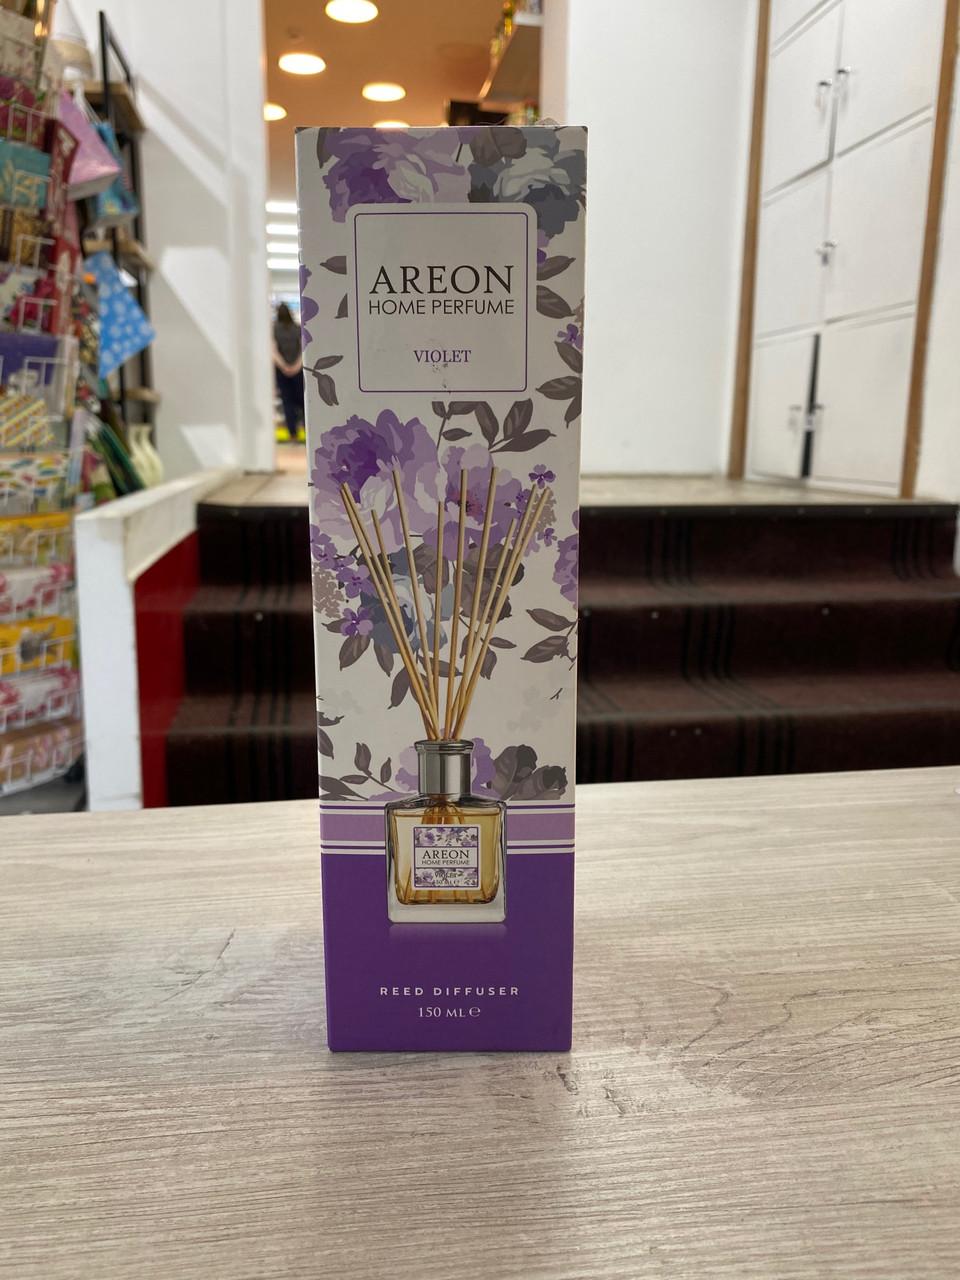 Areon ароматизатор для дома 150 мл Violet